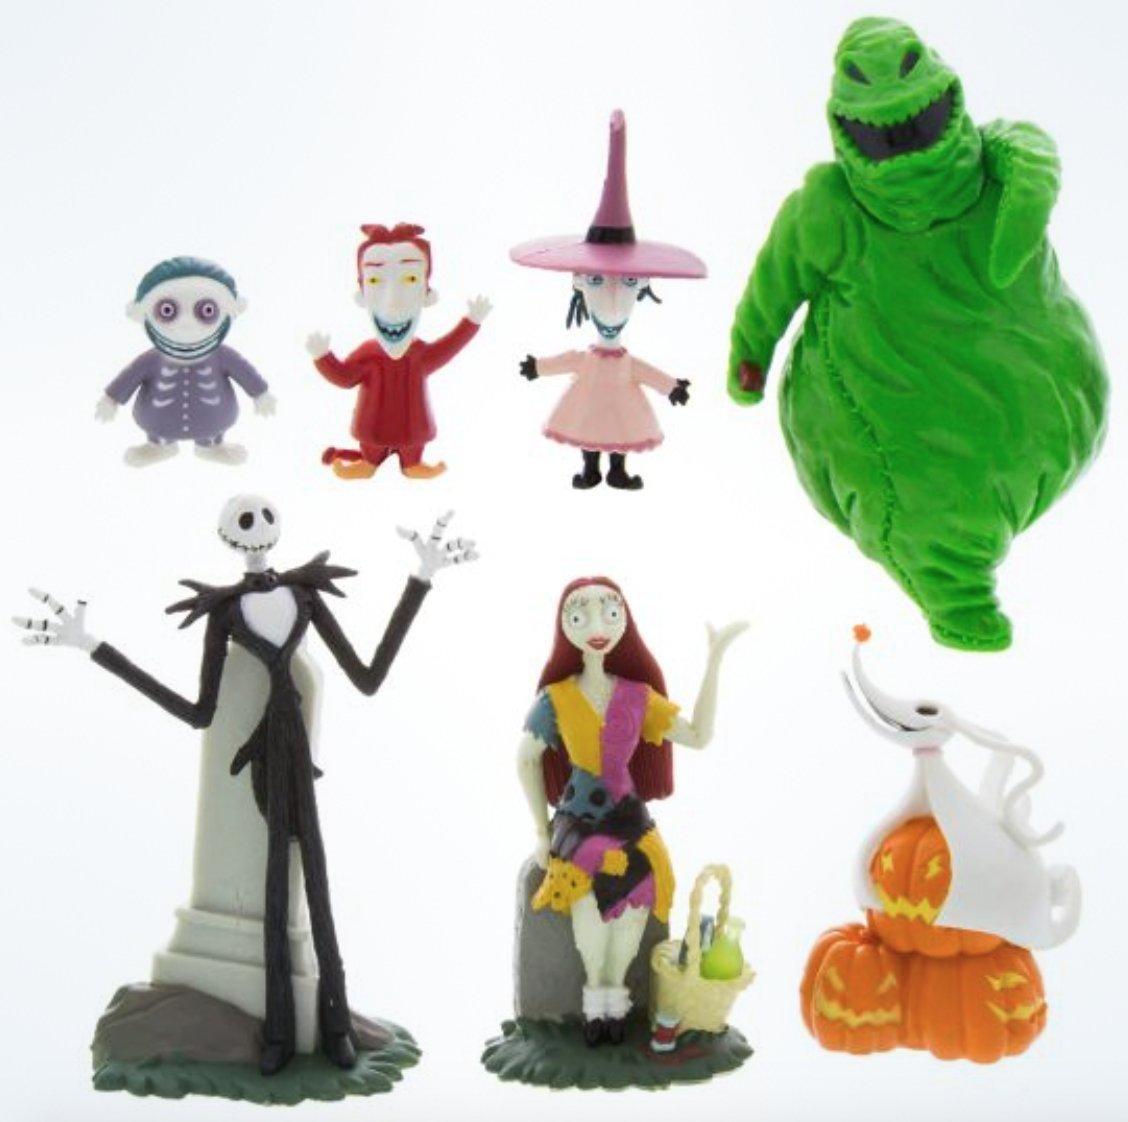 Amazon.com: Disney Parks Exclusive Jack Skellington Nightmare Before ...